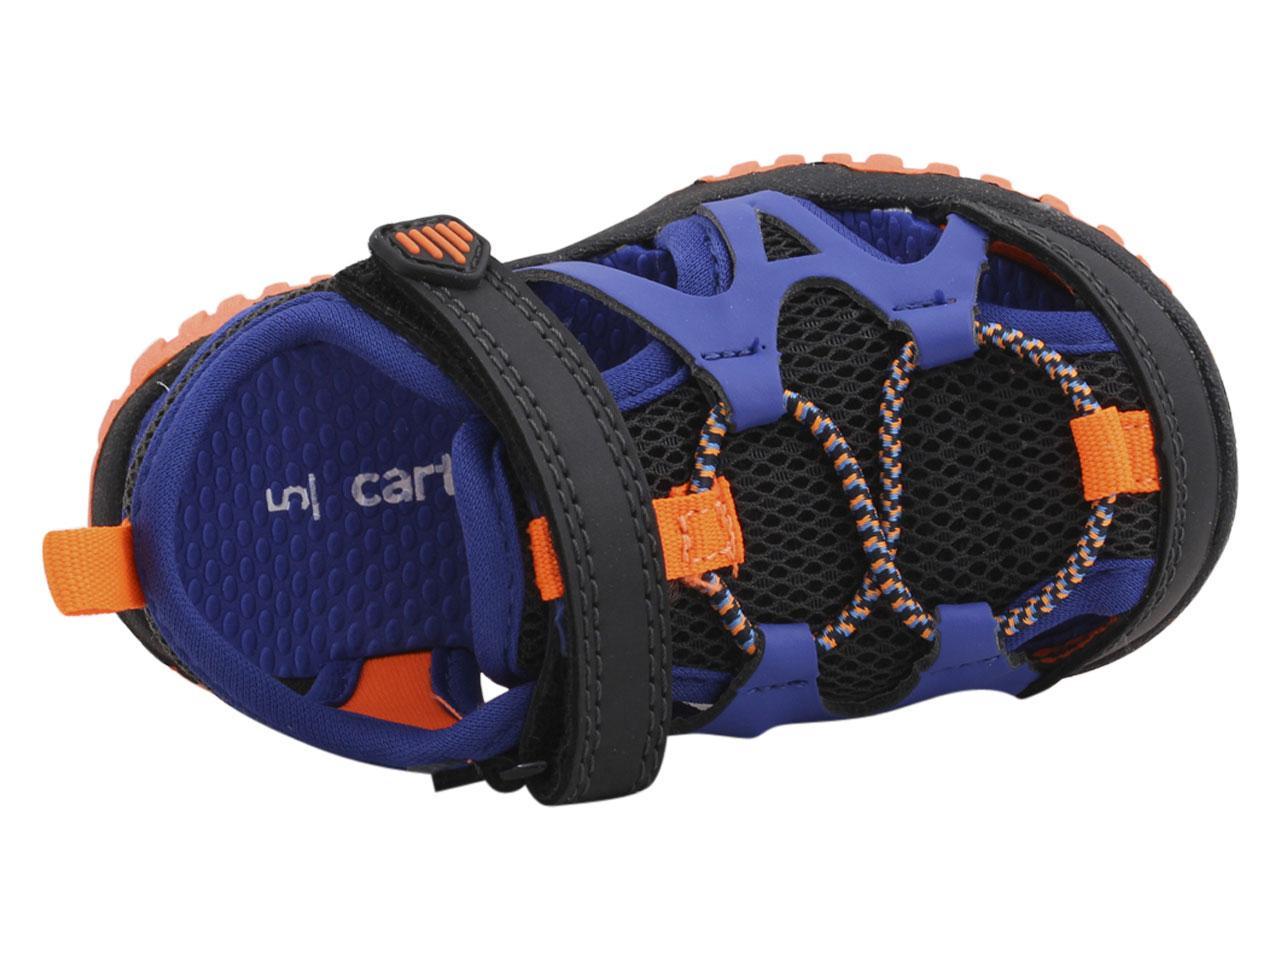 Carter-039-s-Toddler-Boy-039-s-Zyntec-B-Sandals-Shoes thumbnail 12